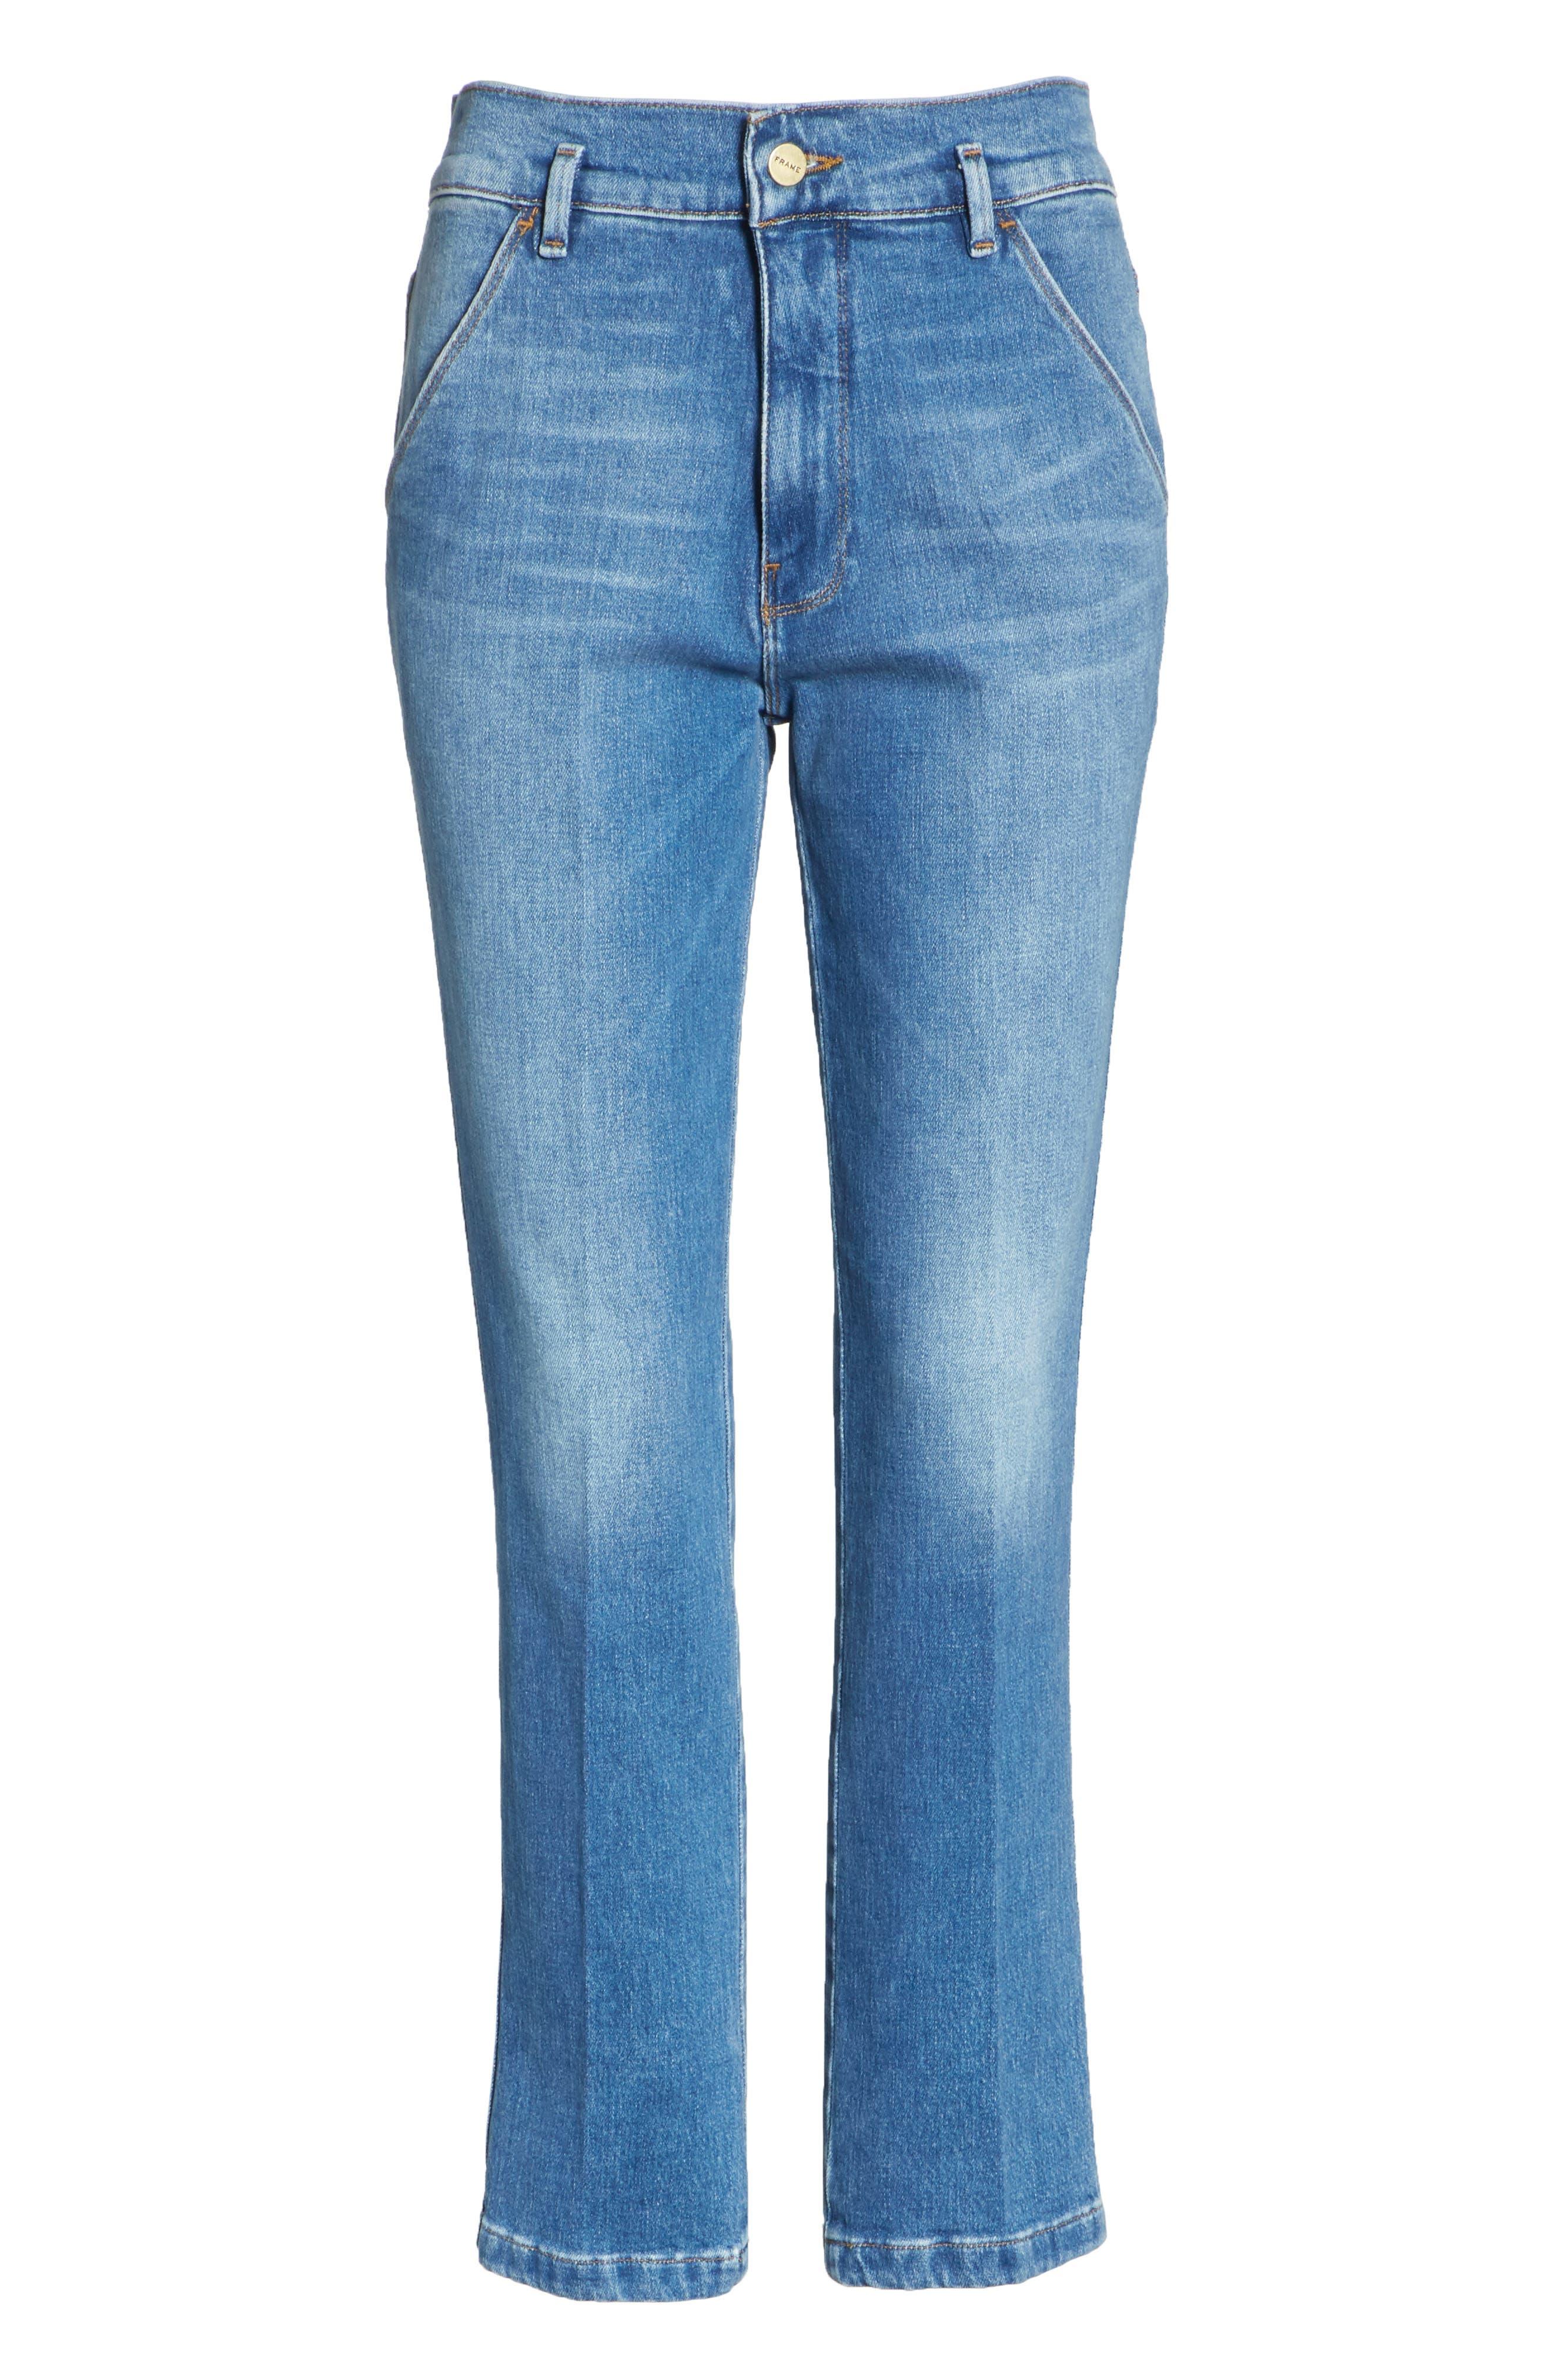 Le Slender Straight Leg Jeans,                             Alternate thumbnail 7, color,                             Thistle